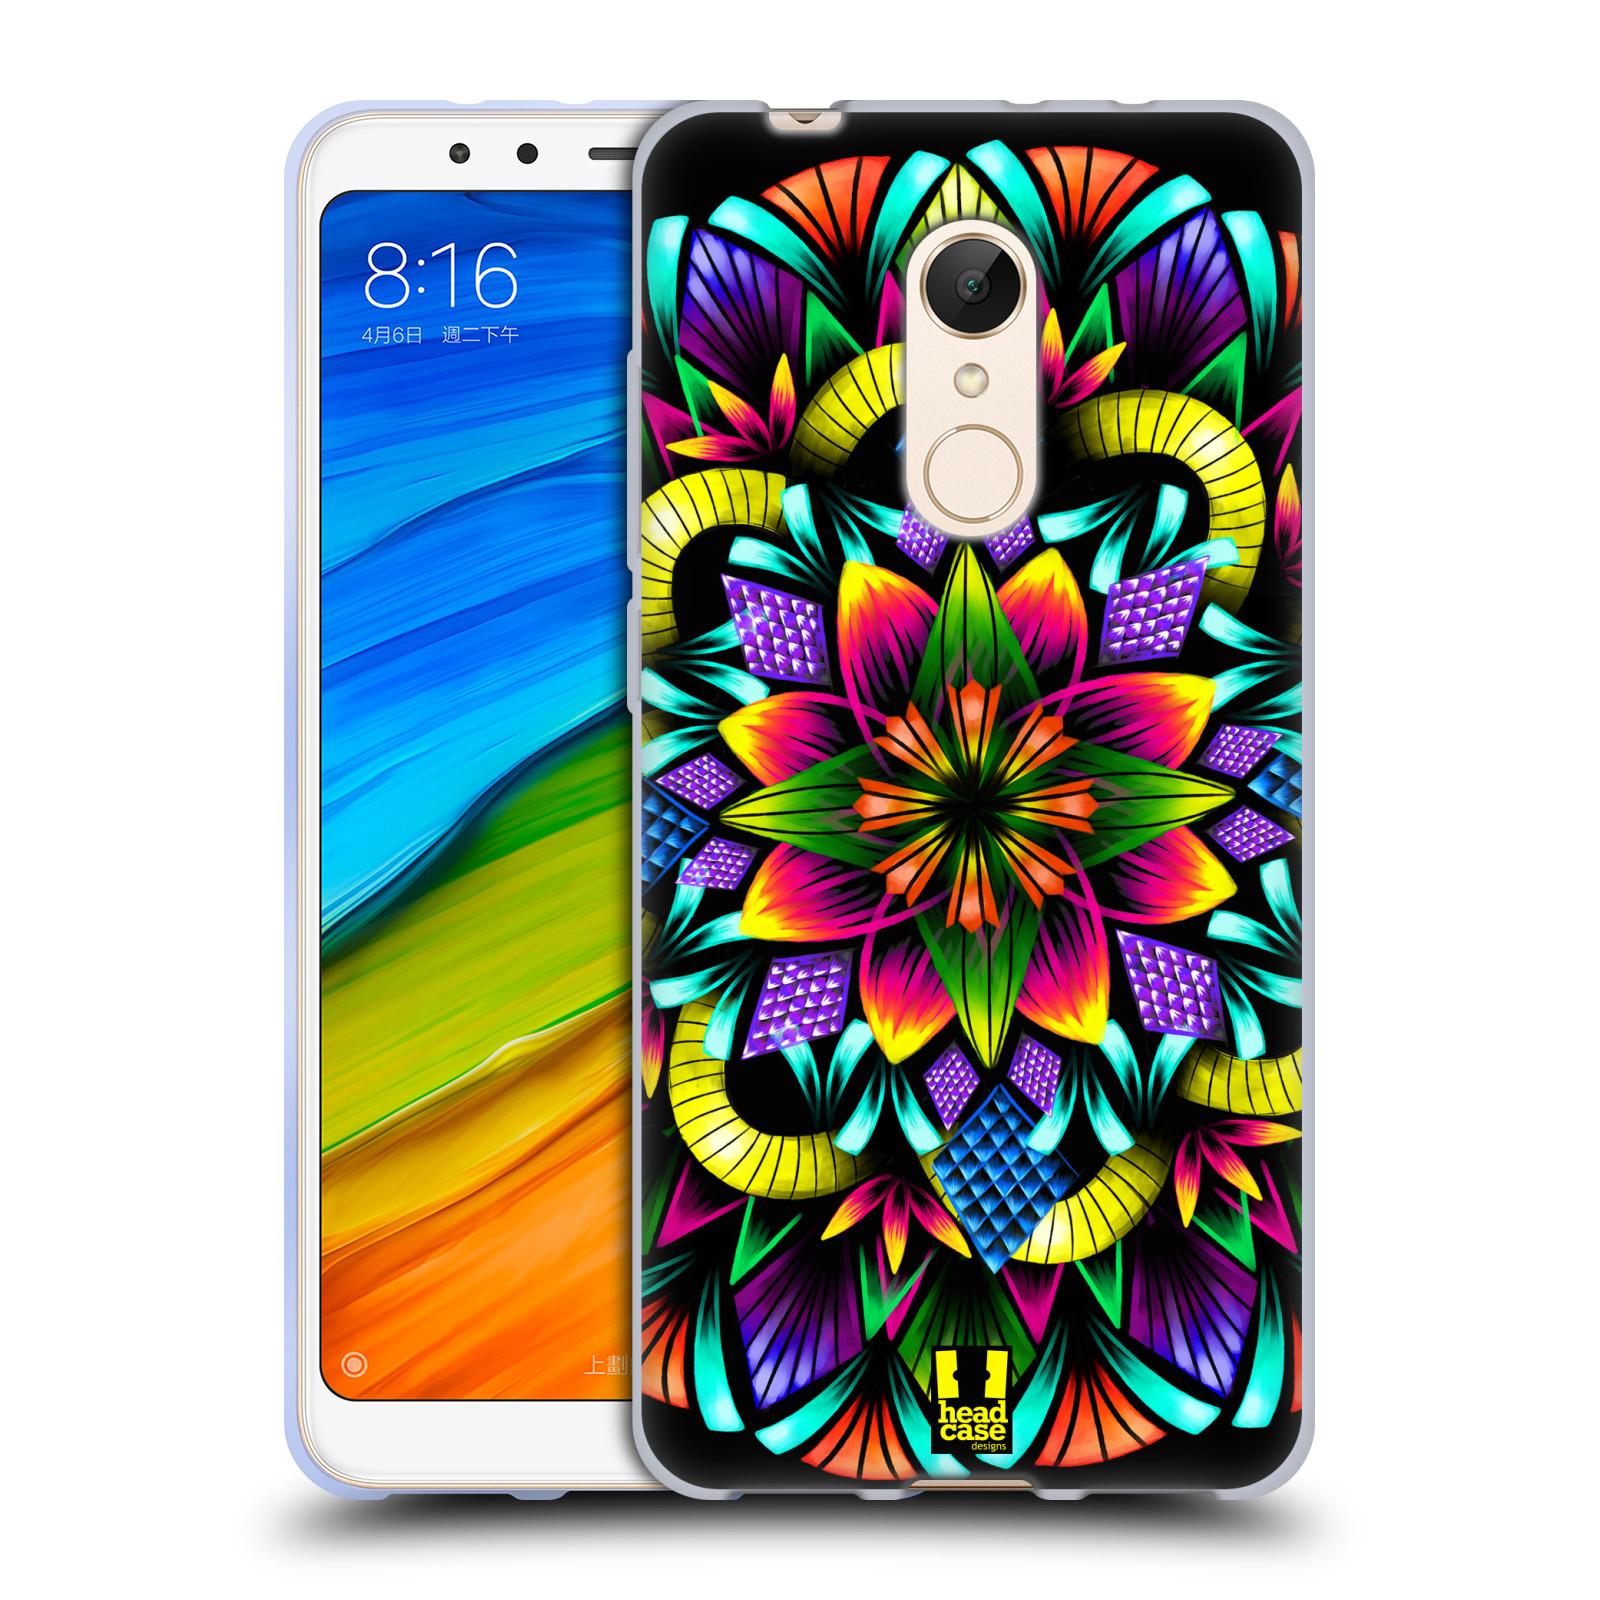 Silikonové pouzdro na mobil Xiaomi Redmi 5 - Head Case - Květina mandala